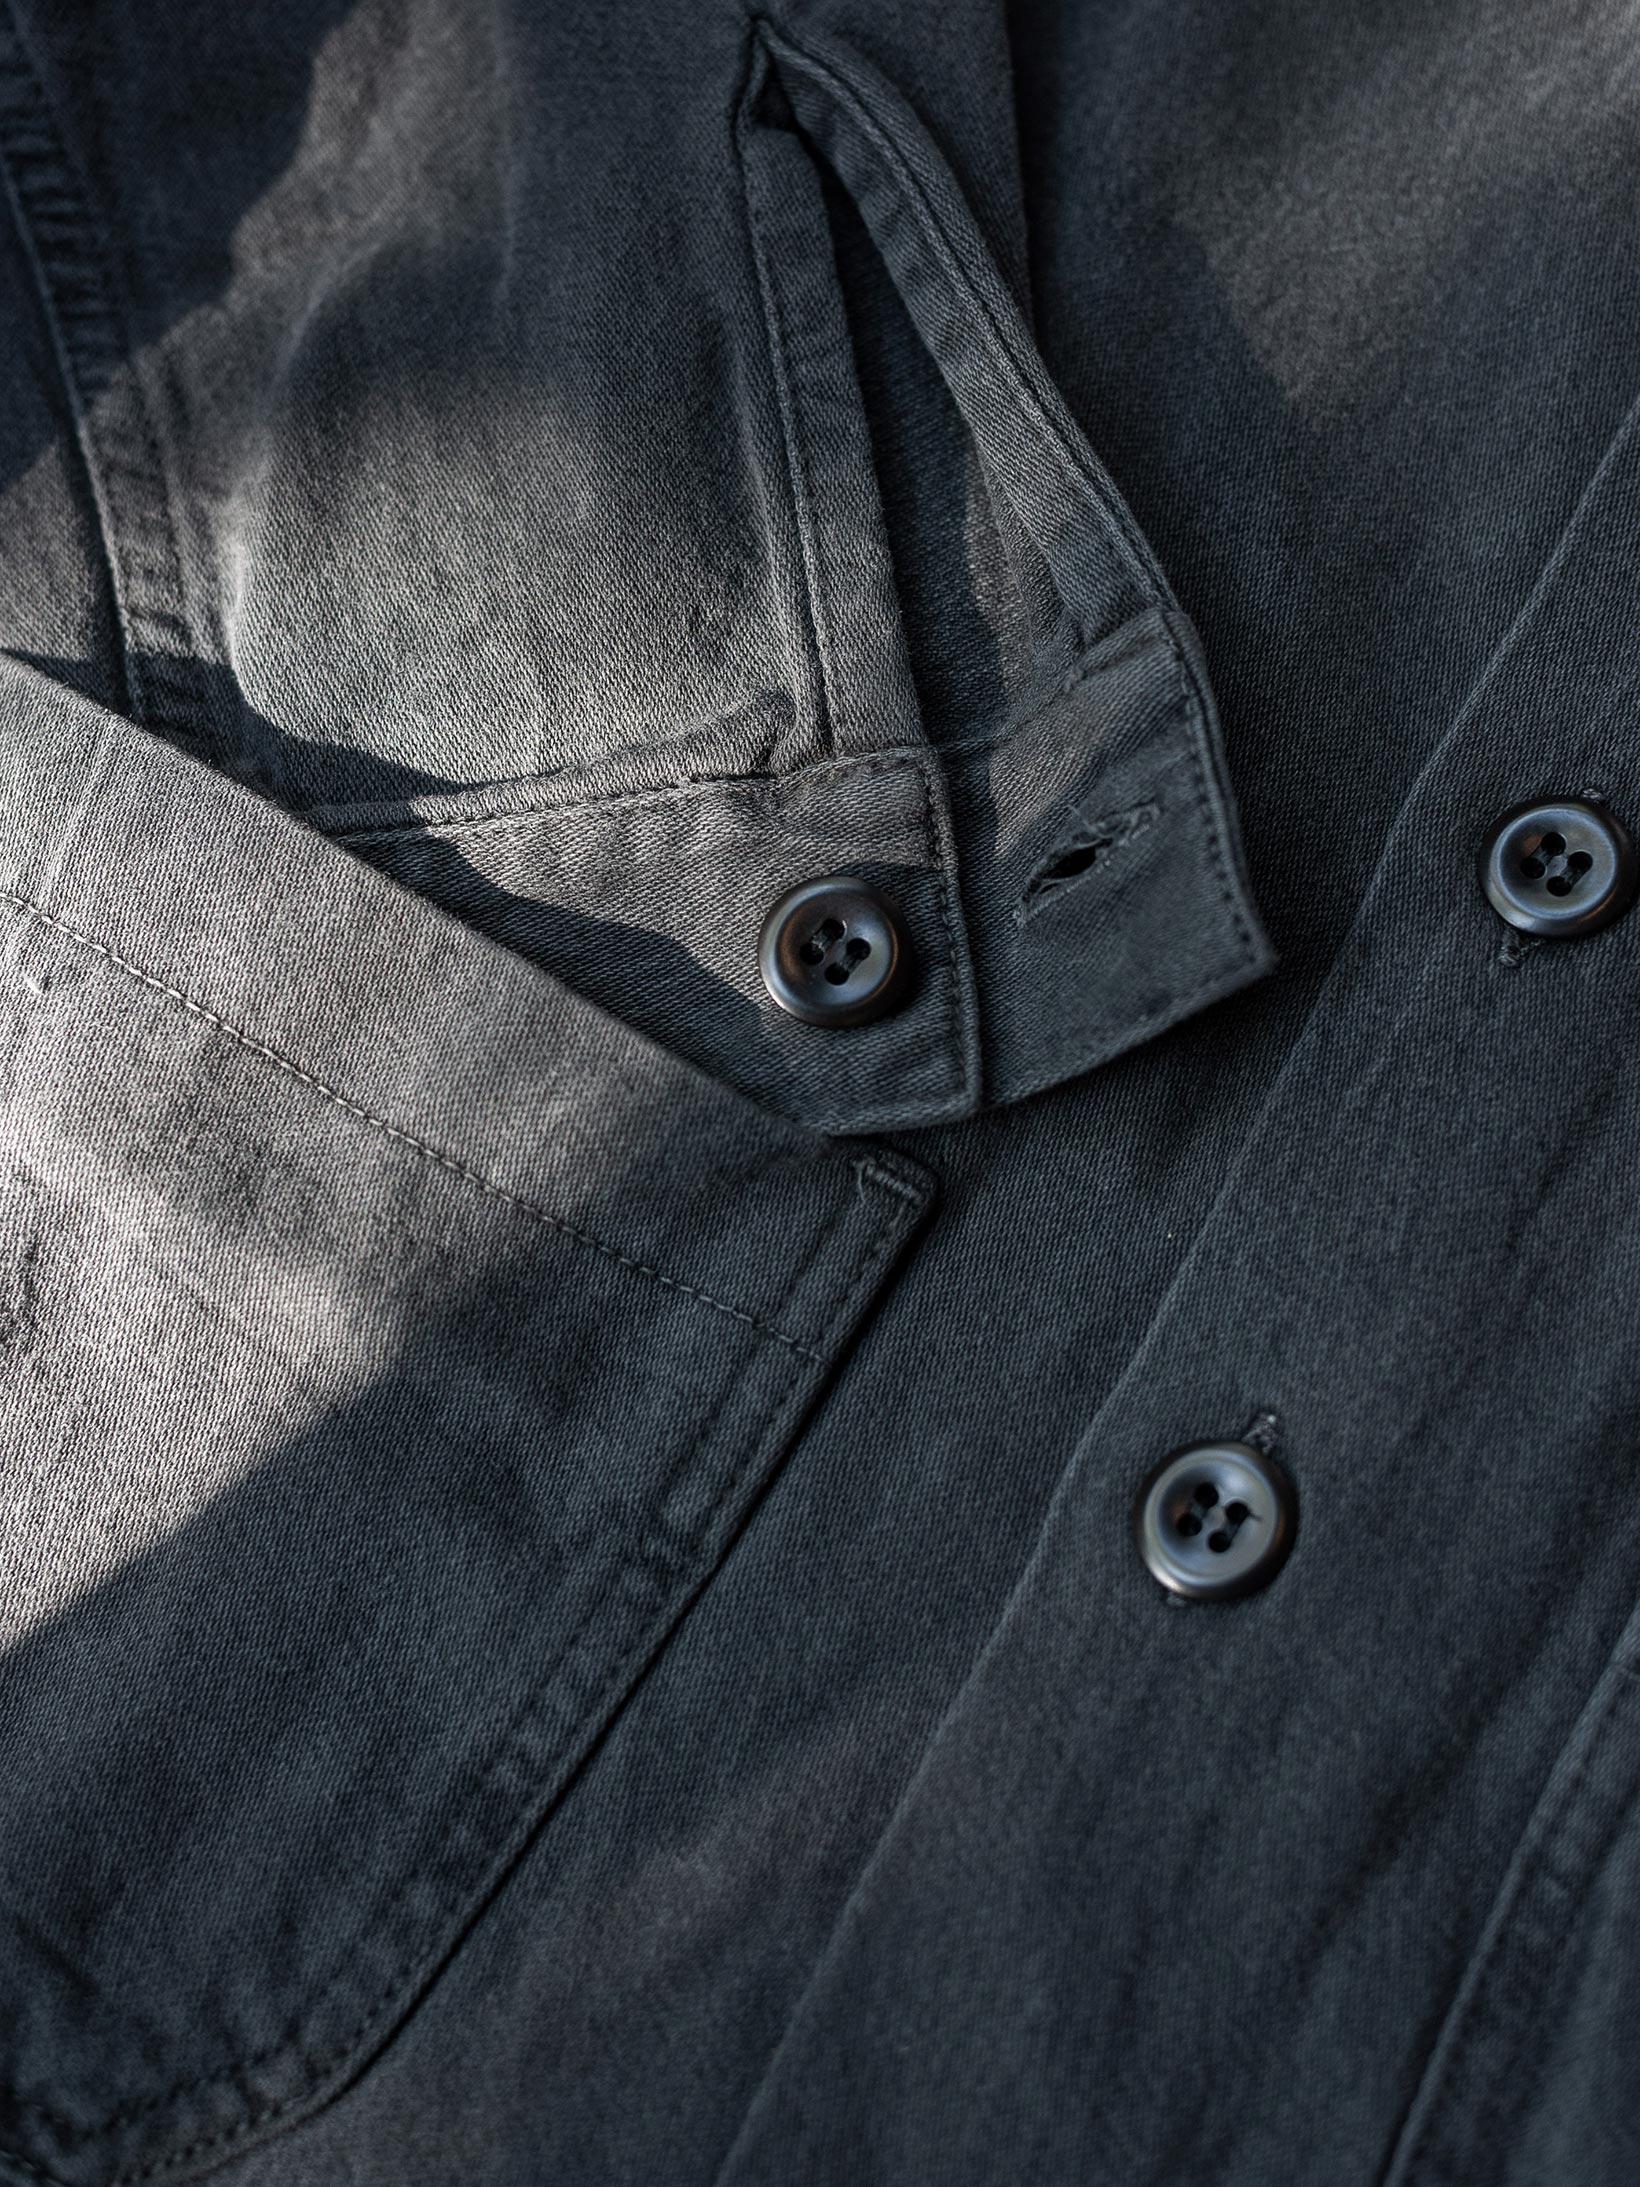 3sixteen Garment Dyed Shop Jacket - Smoke - Image 16